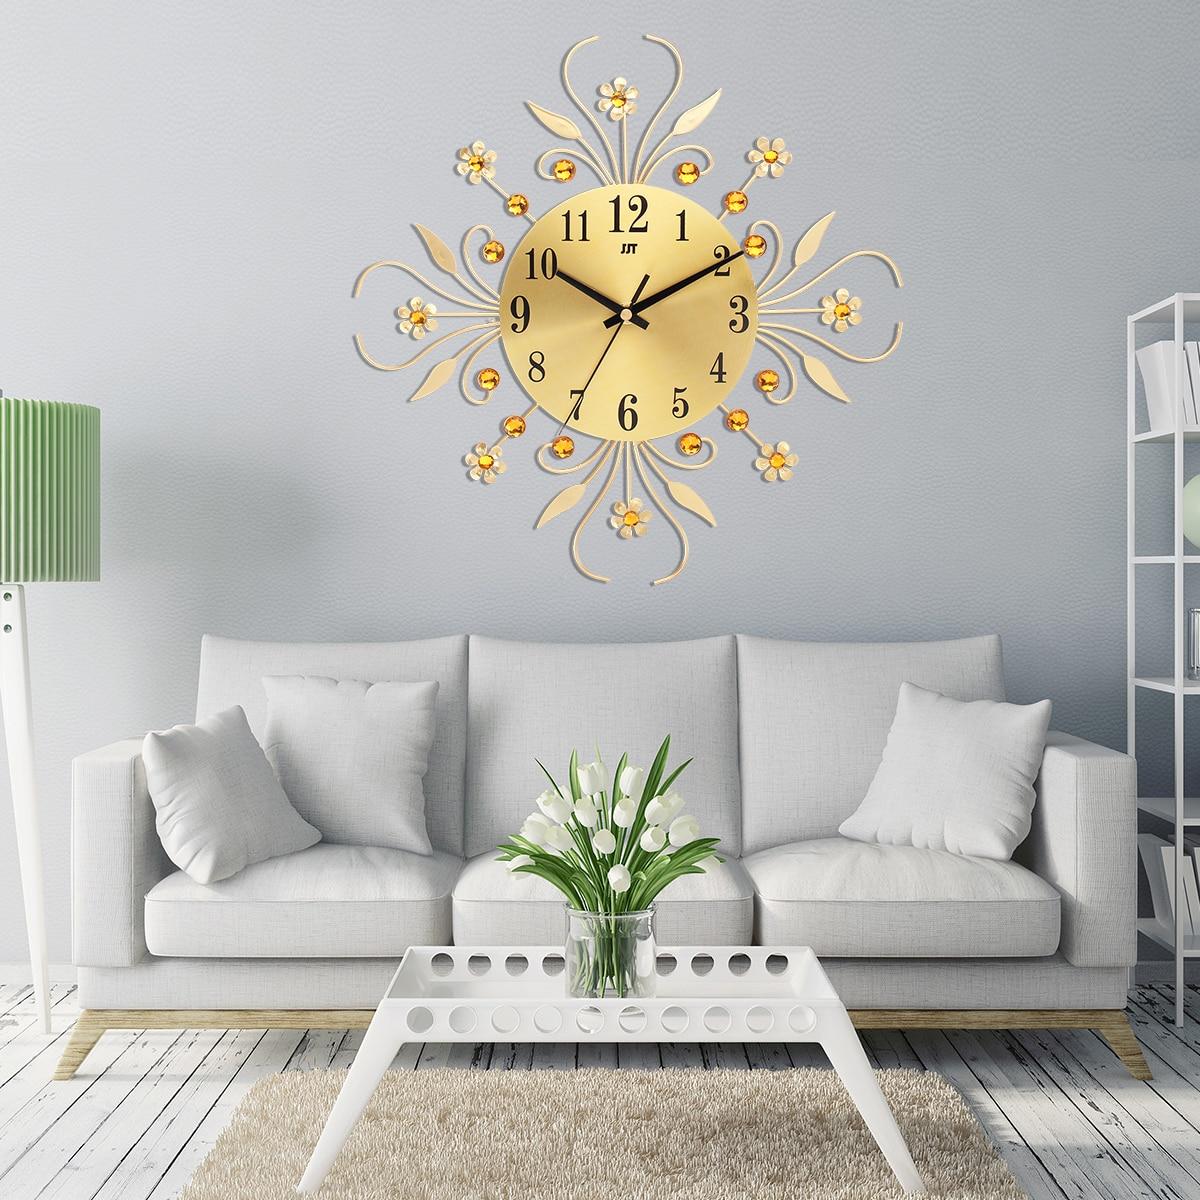 35cm Black Gold Hanging Wall Clock Home Decor 3D Modern Metal ...